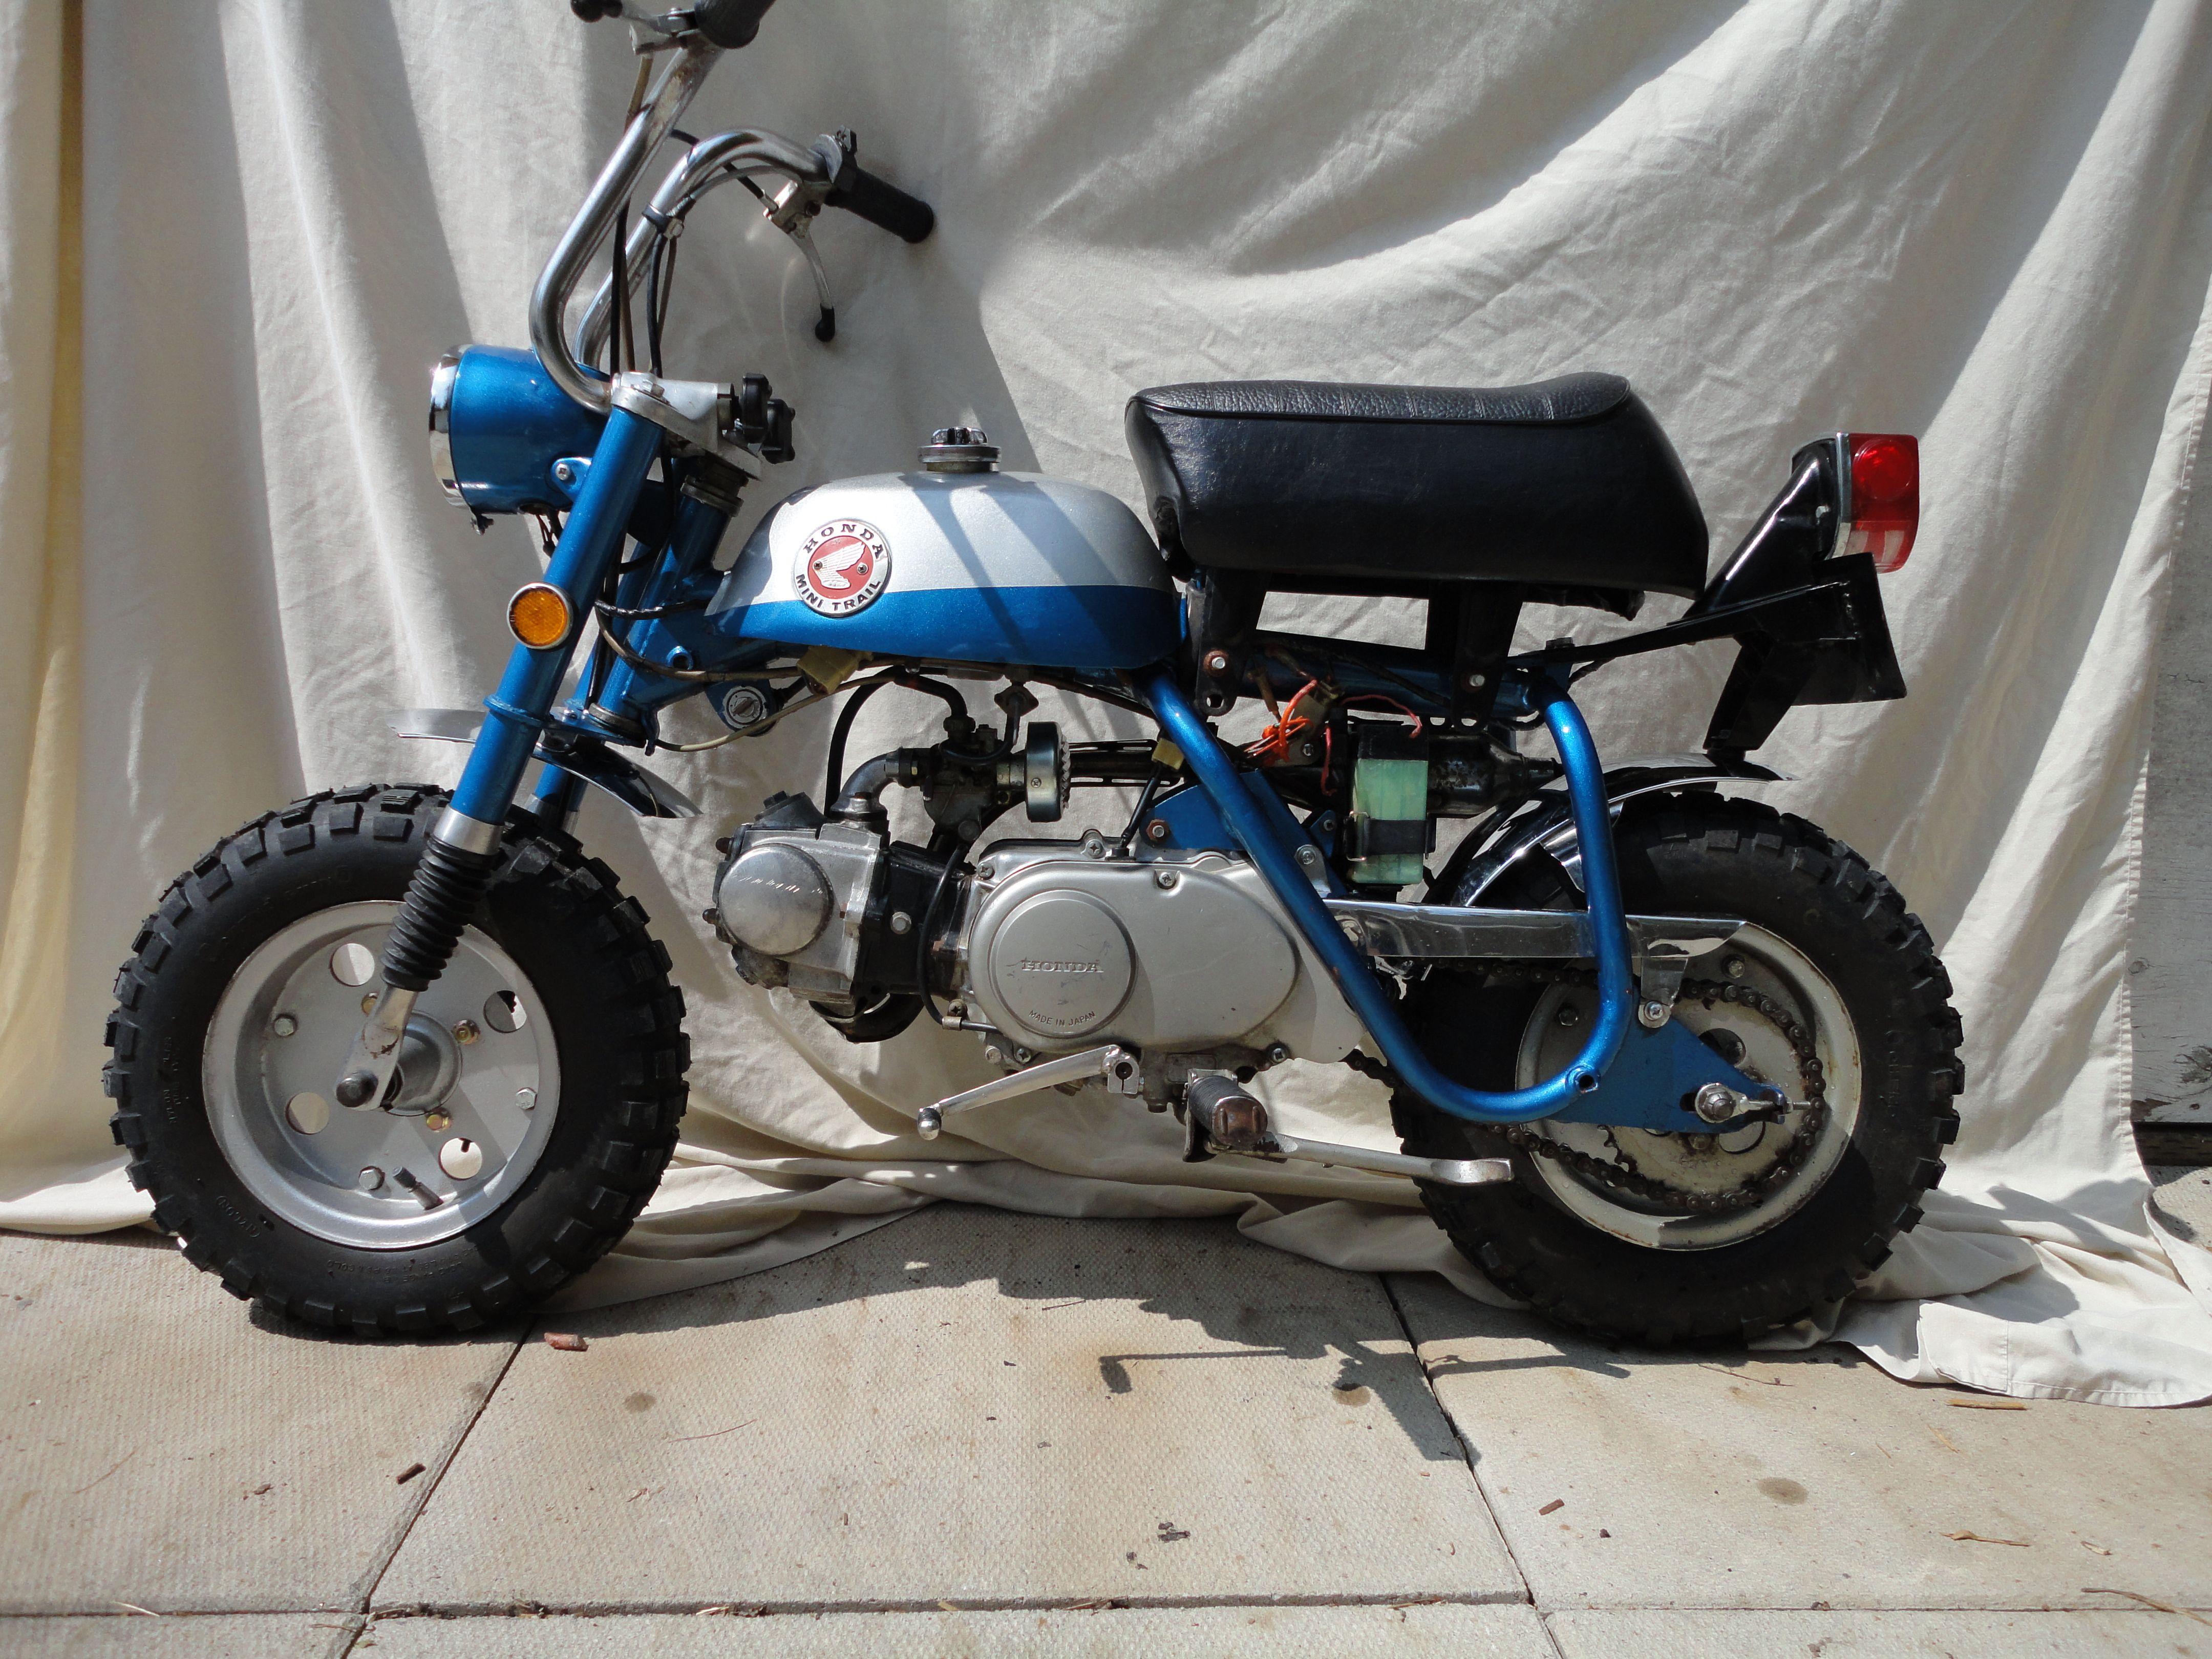 1969 honda mini trail z50ak0 the mini motorcycle that. Black Bedroom Furniture Sets. Home Design Ideas